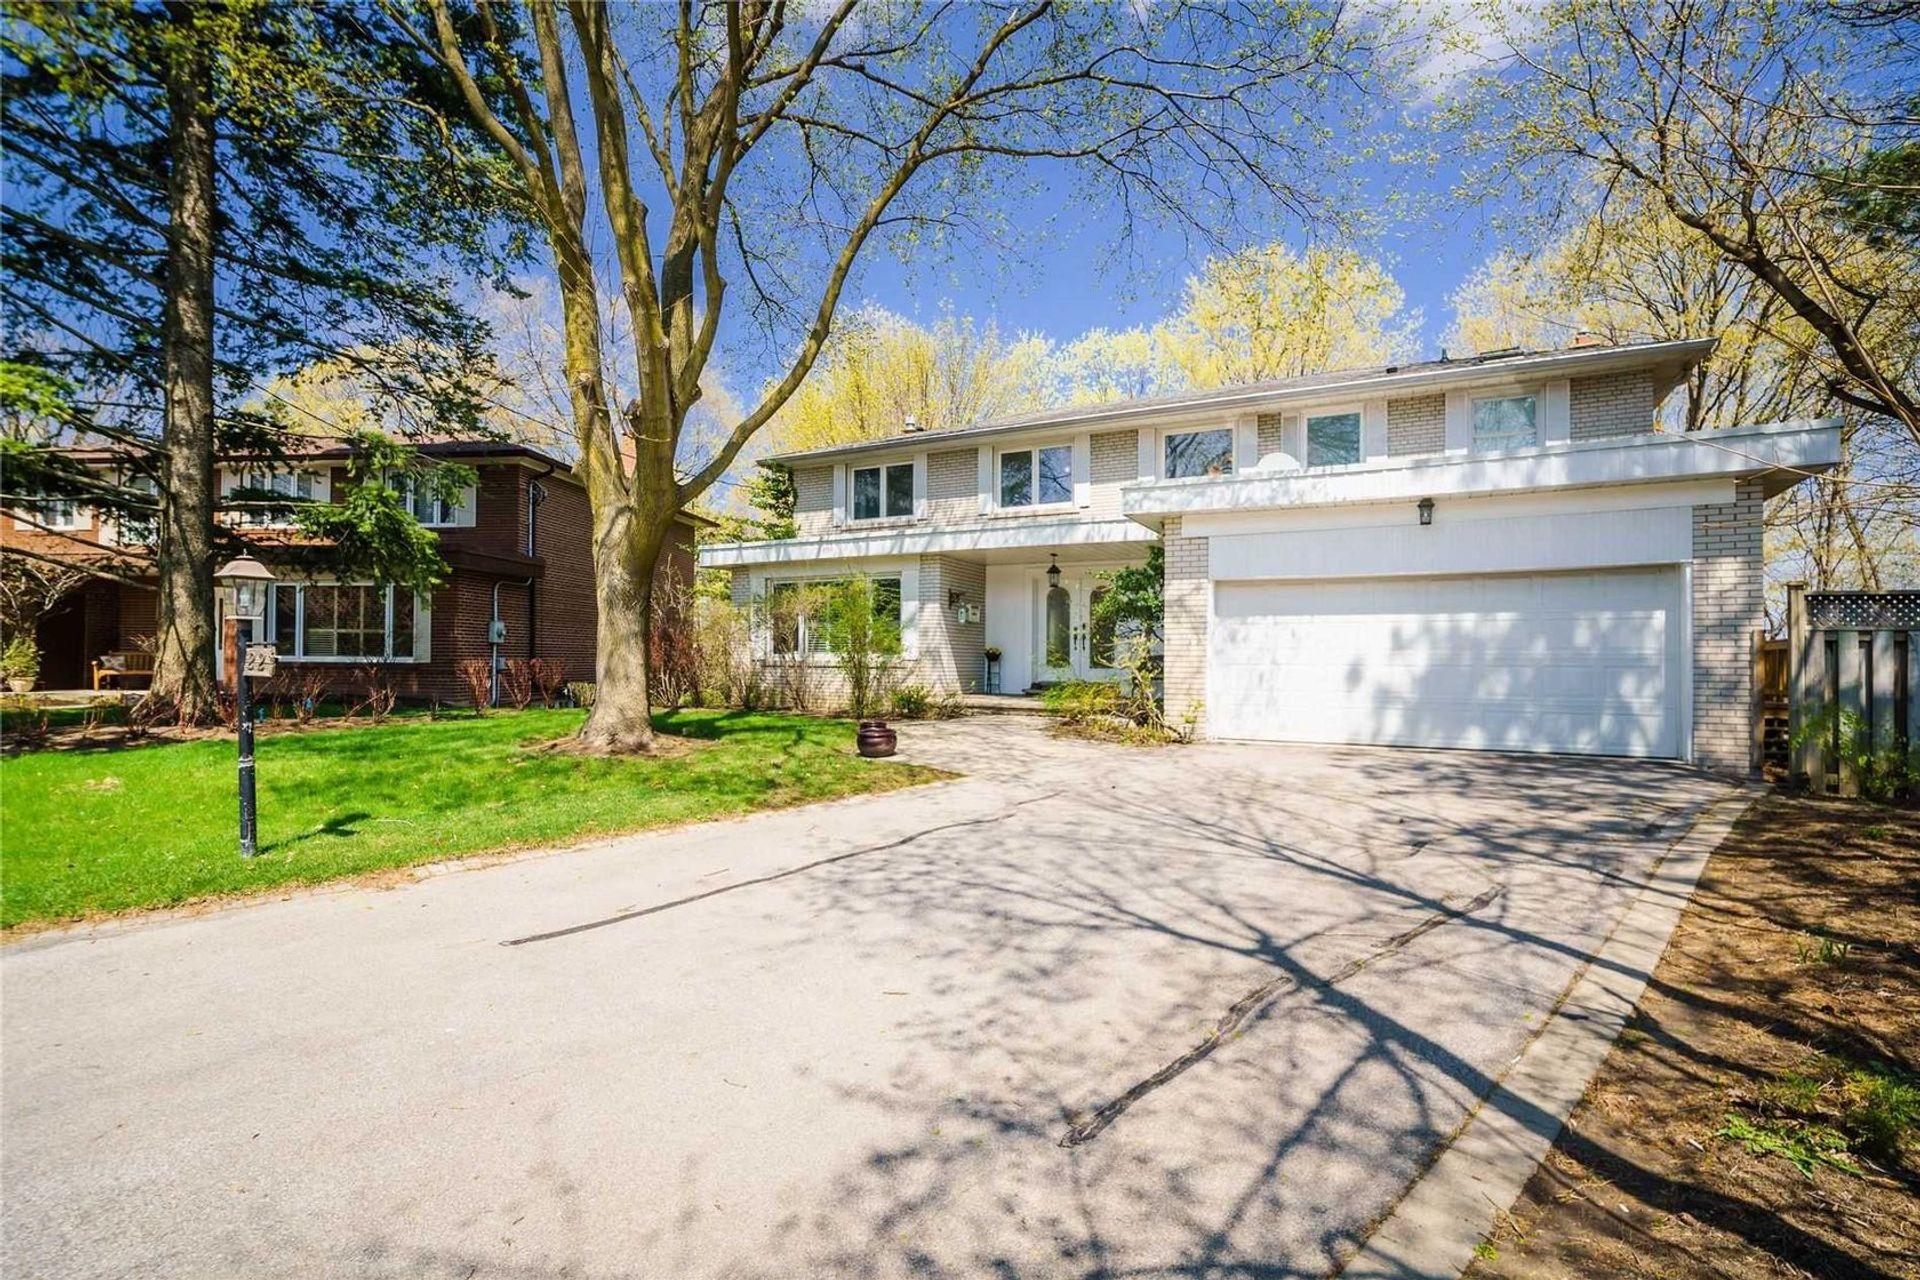 22-woodthrush-crt-bayview-village-toronto-01 at 22 Woodthrush Court, Bayview Village, Toronto